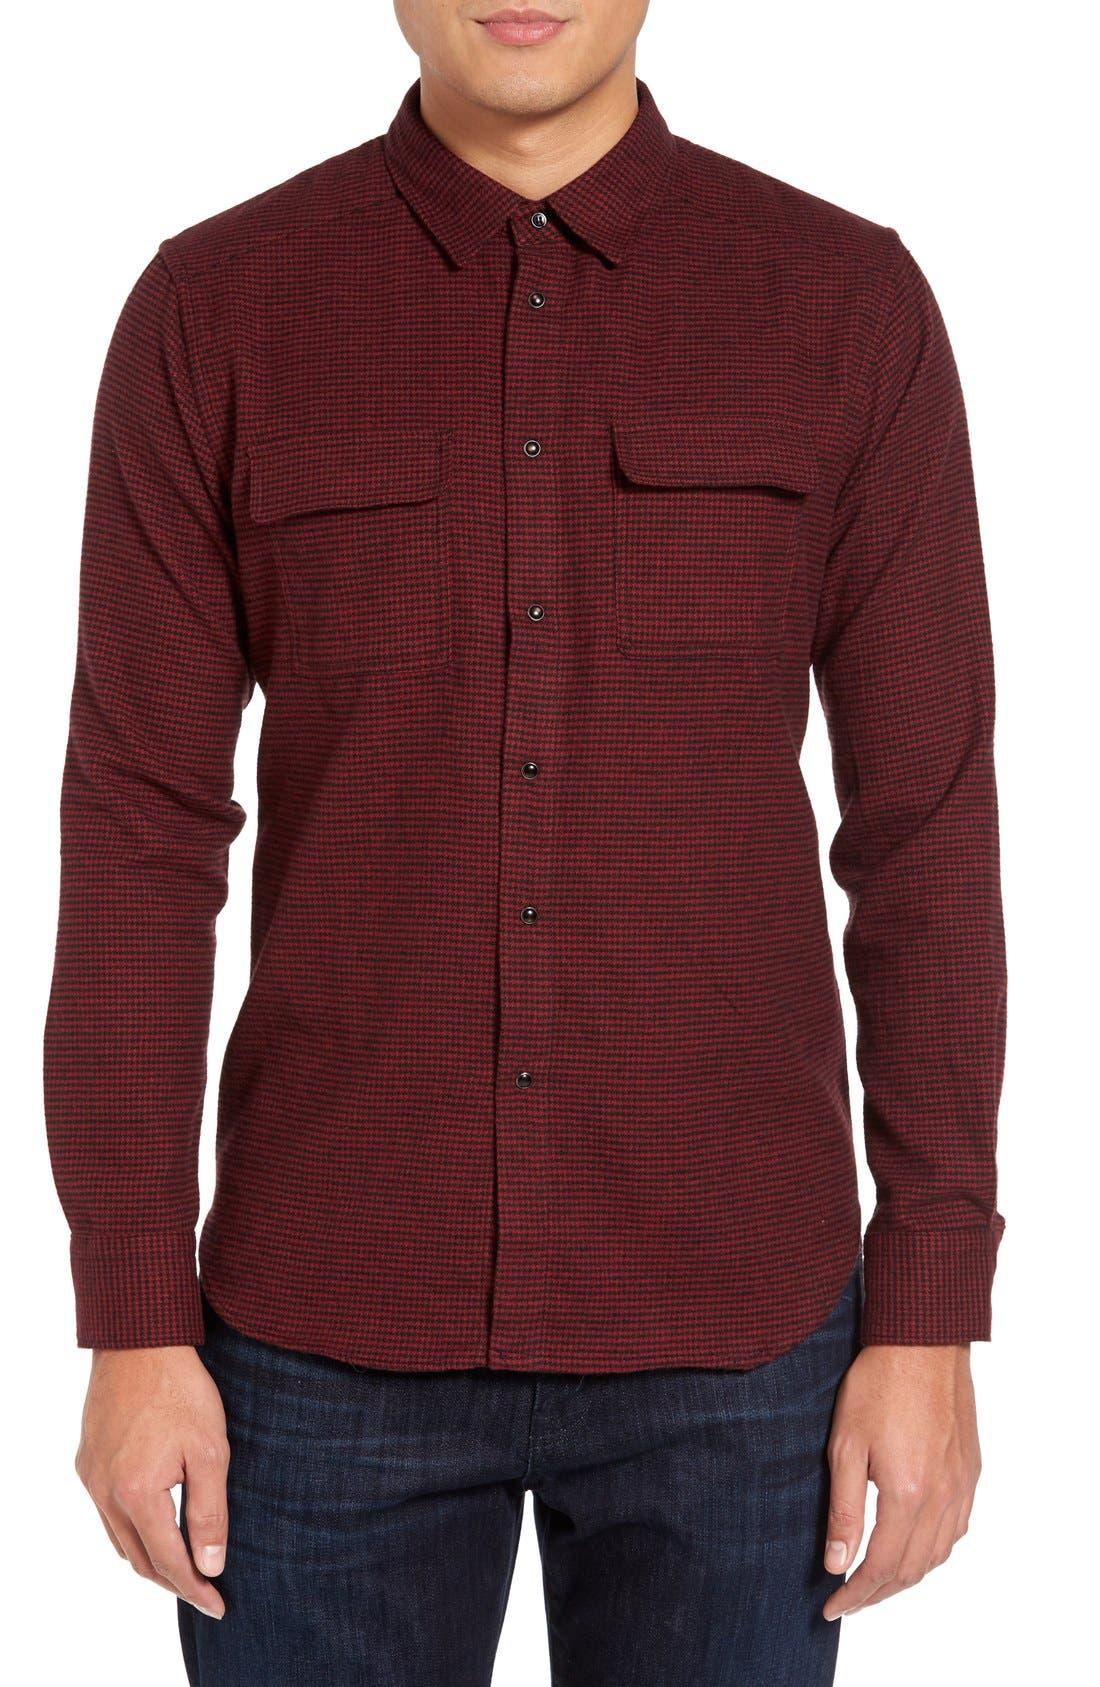 Alternate Image 1 Selected - Slate & Stone Parker Slim Fit Houndstooth Flannel Shirt